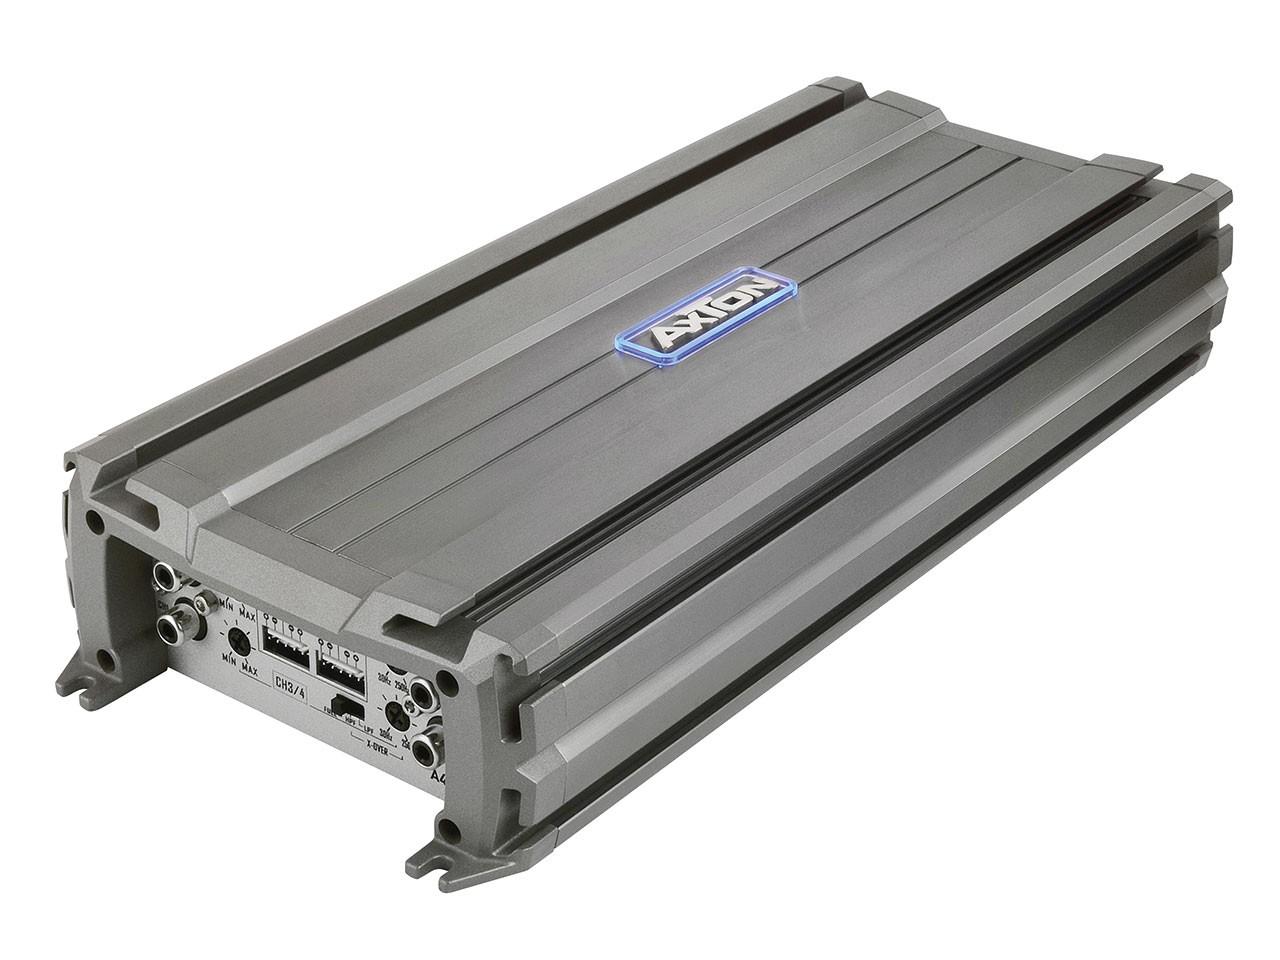 A480 - AXTON Amplifier 4 x 85 Watt